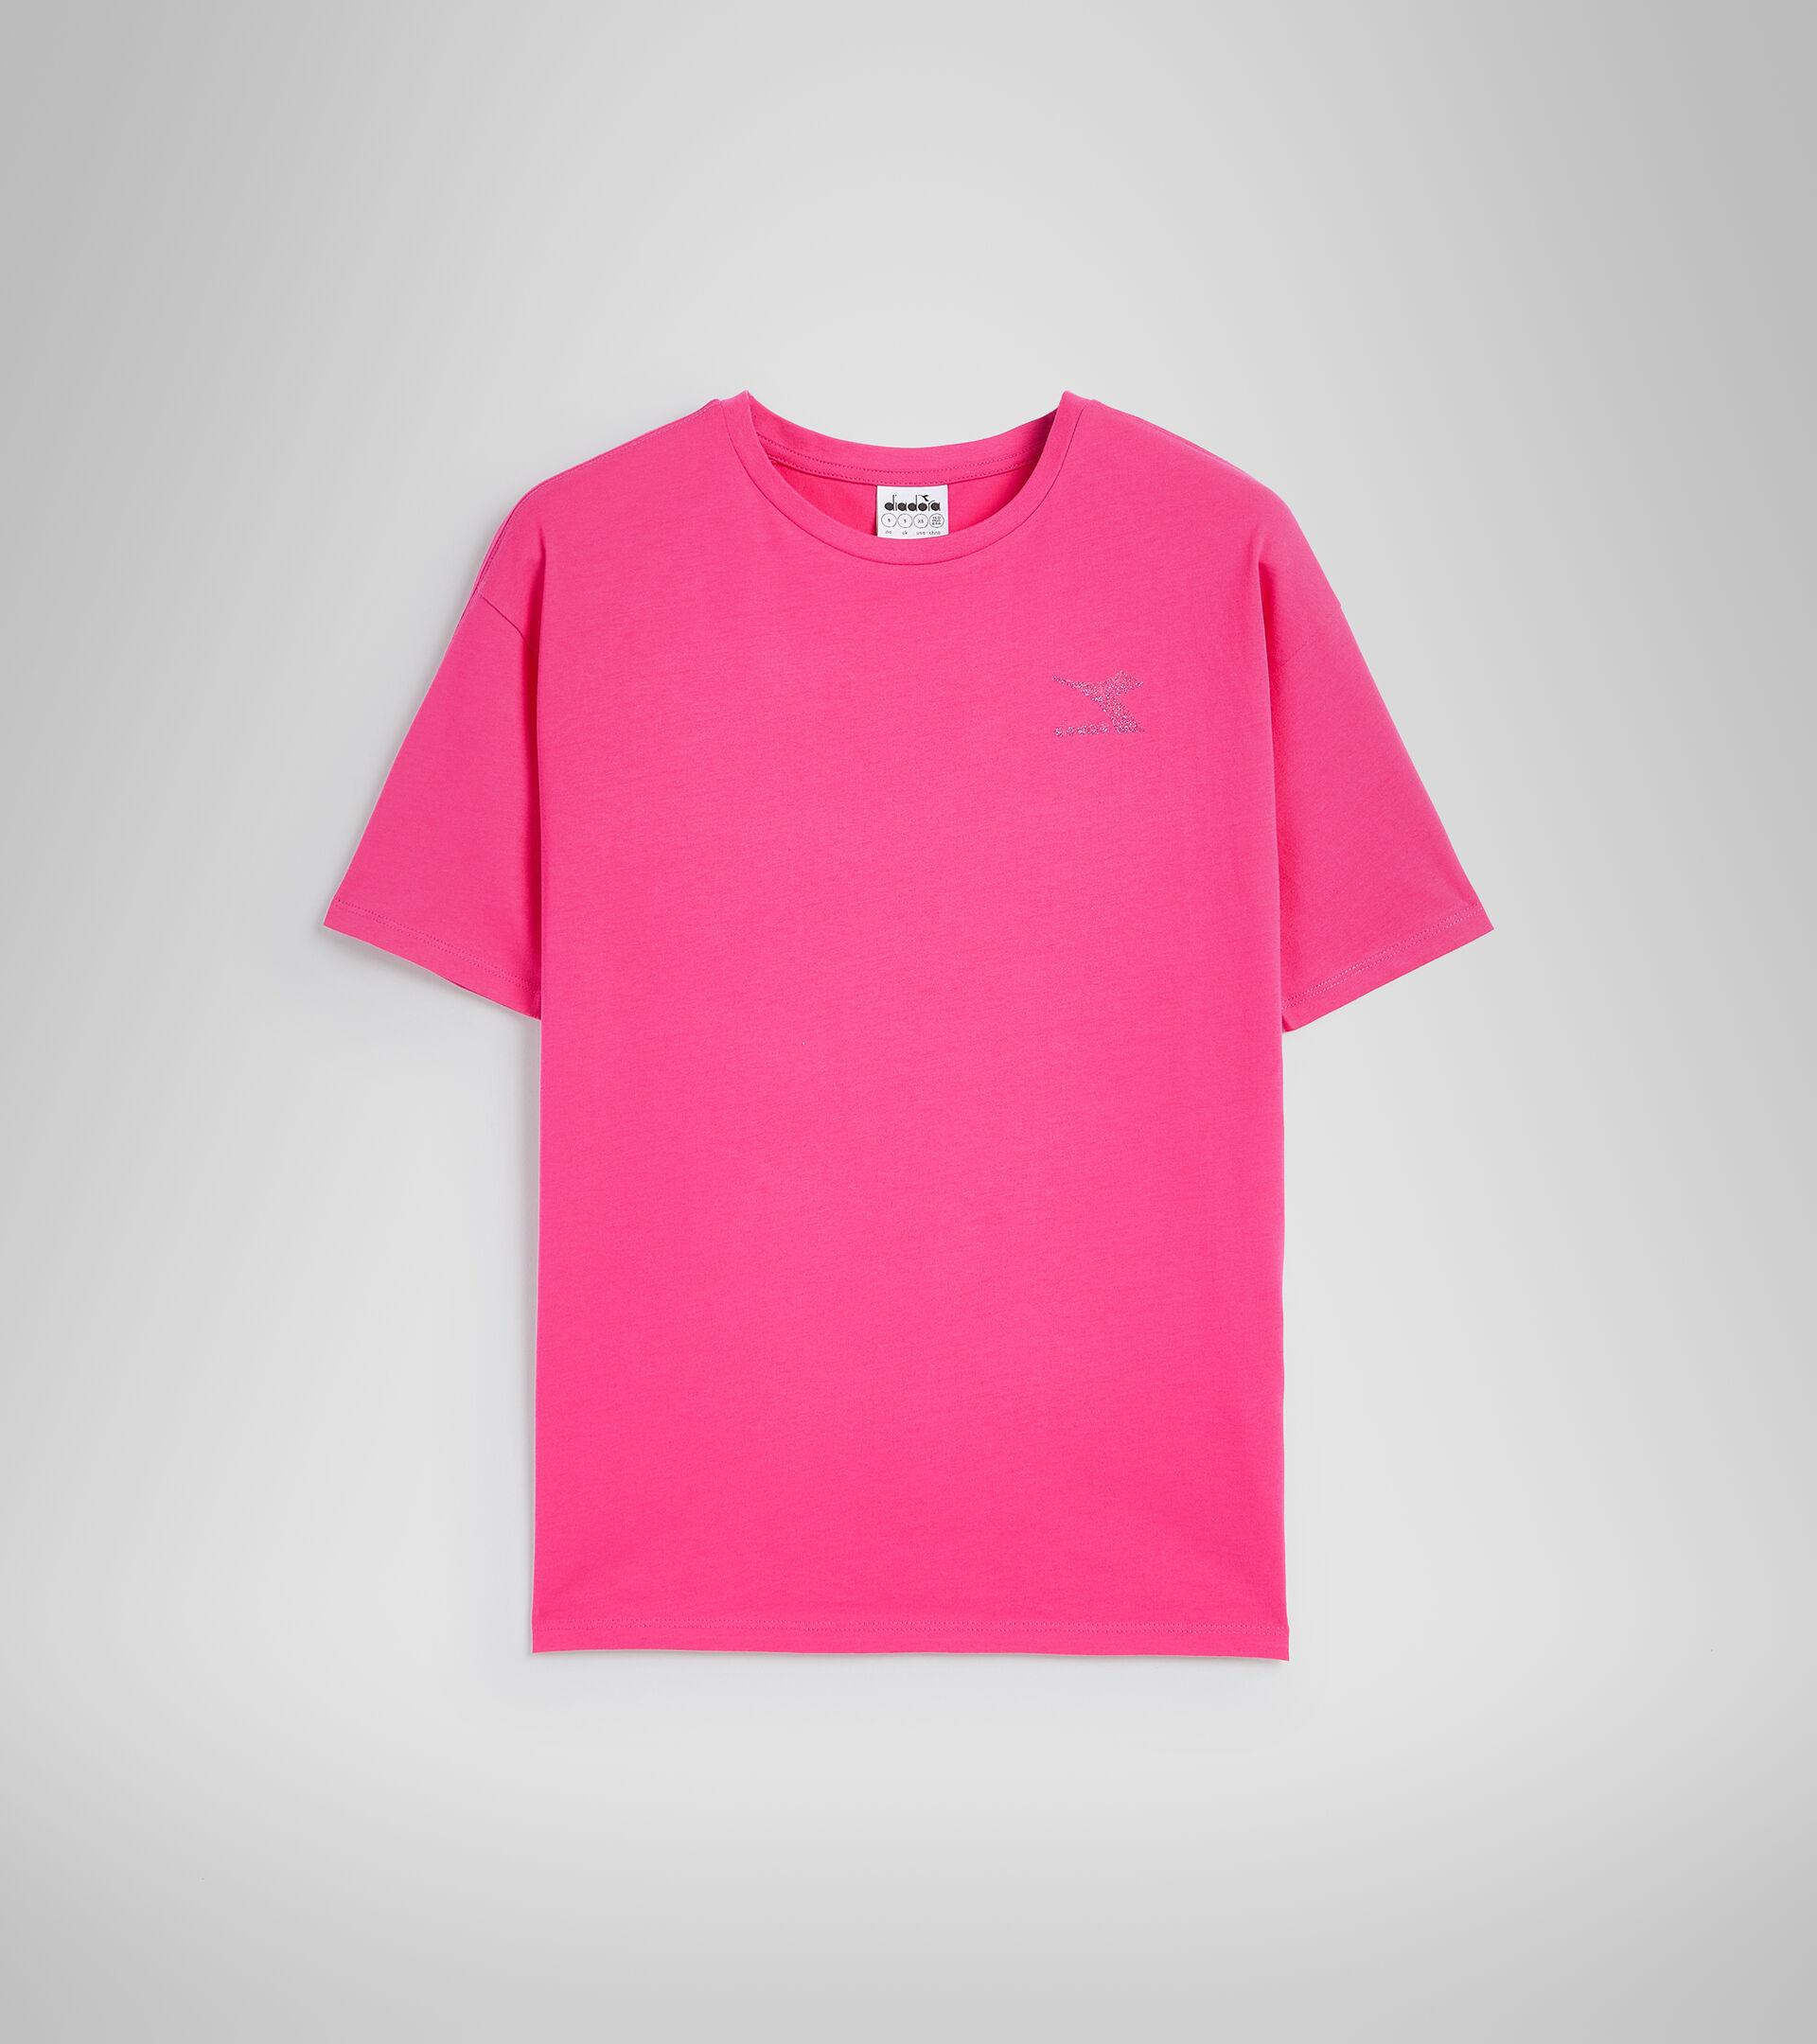 Camiseta - Mujer L.T-SHIRT SS BLINK MAGENTA - Diadora